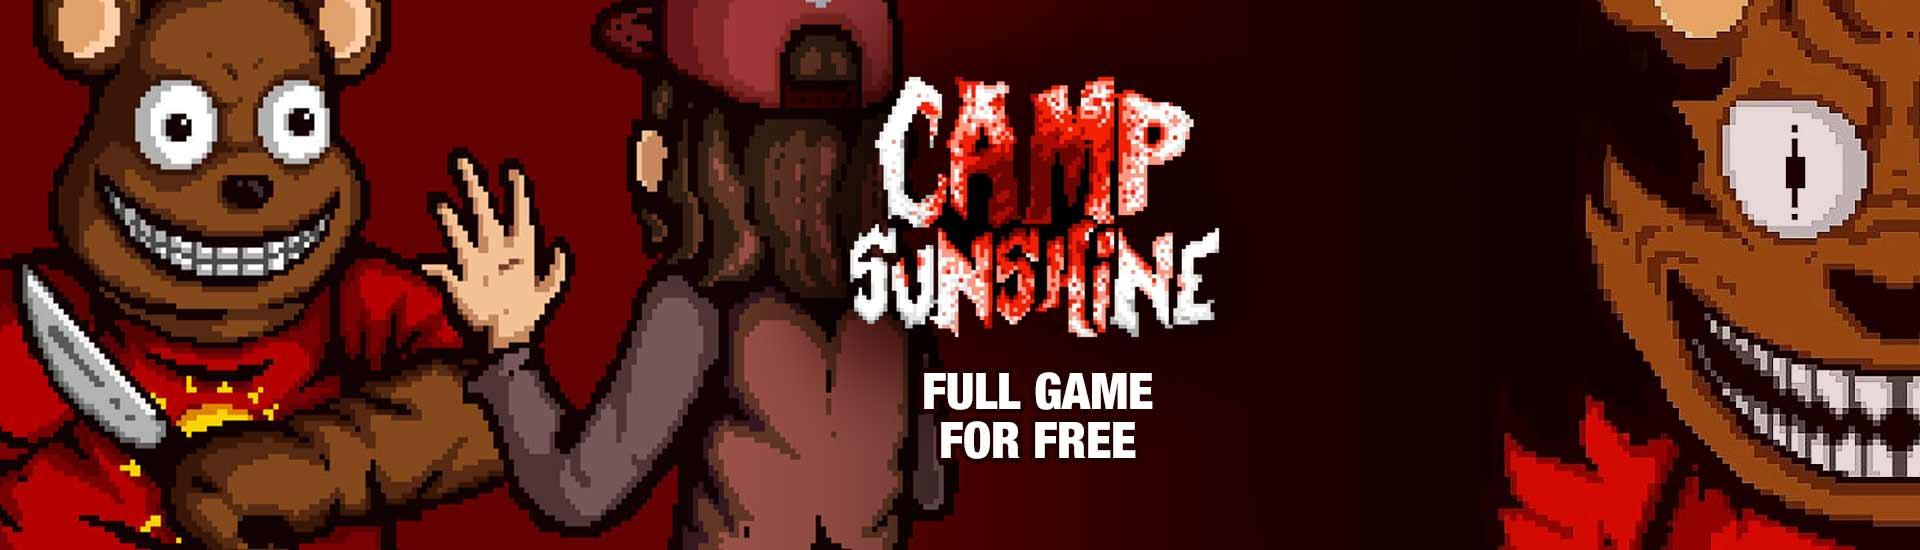 Camp Sunshine PC download gratis